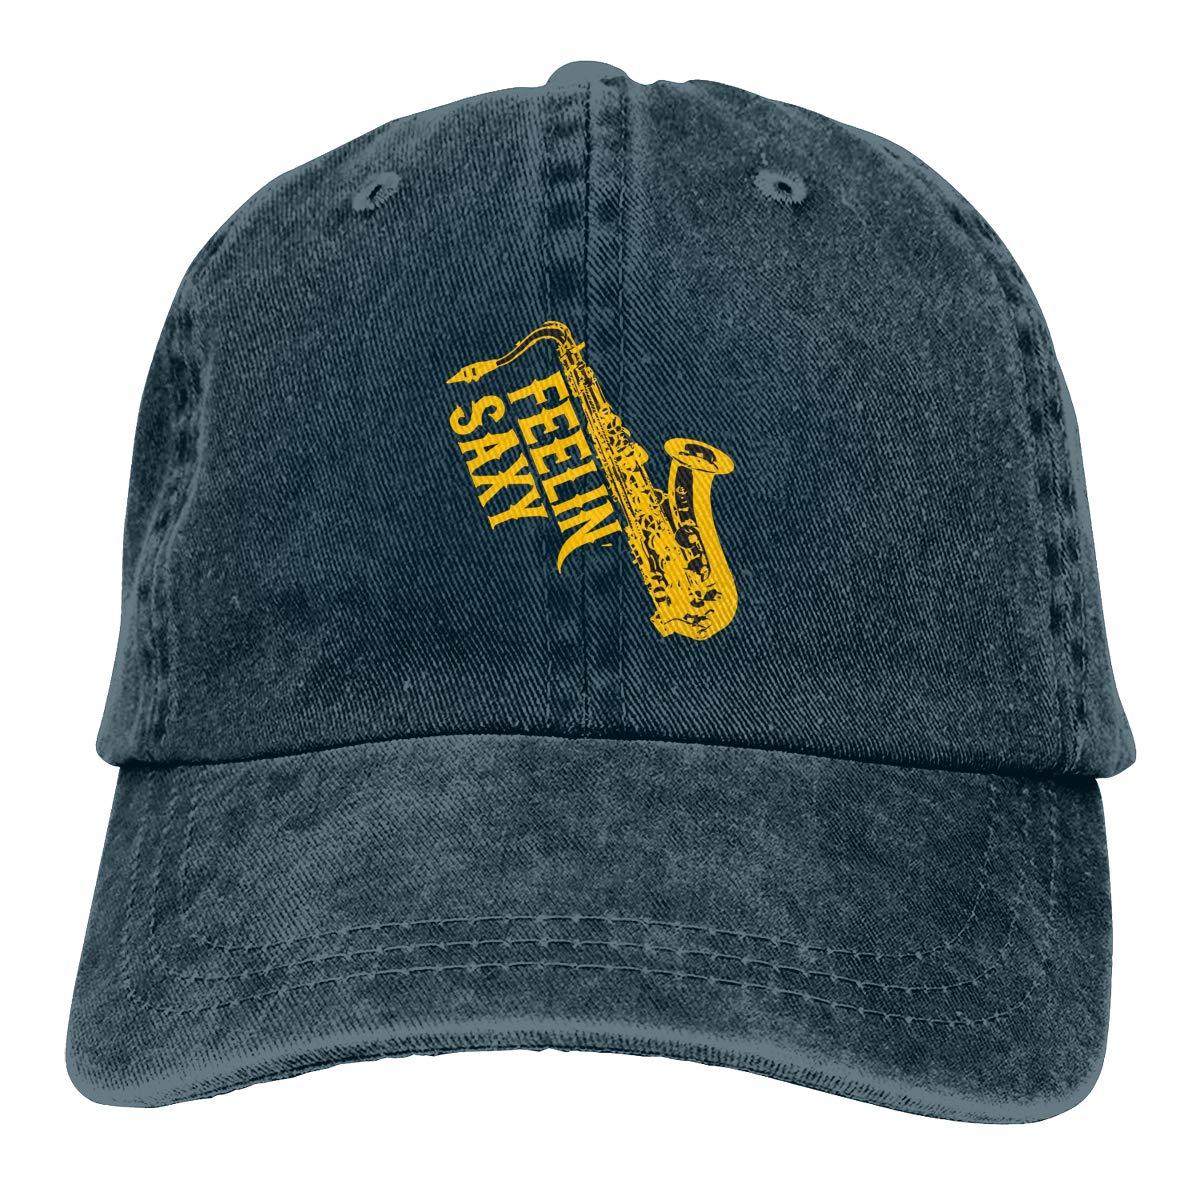 Feelin Saxy Saxophone Fashion Adjustable Cowboy Cap Denim Hat for Women and Men